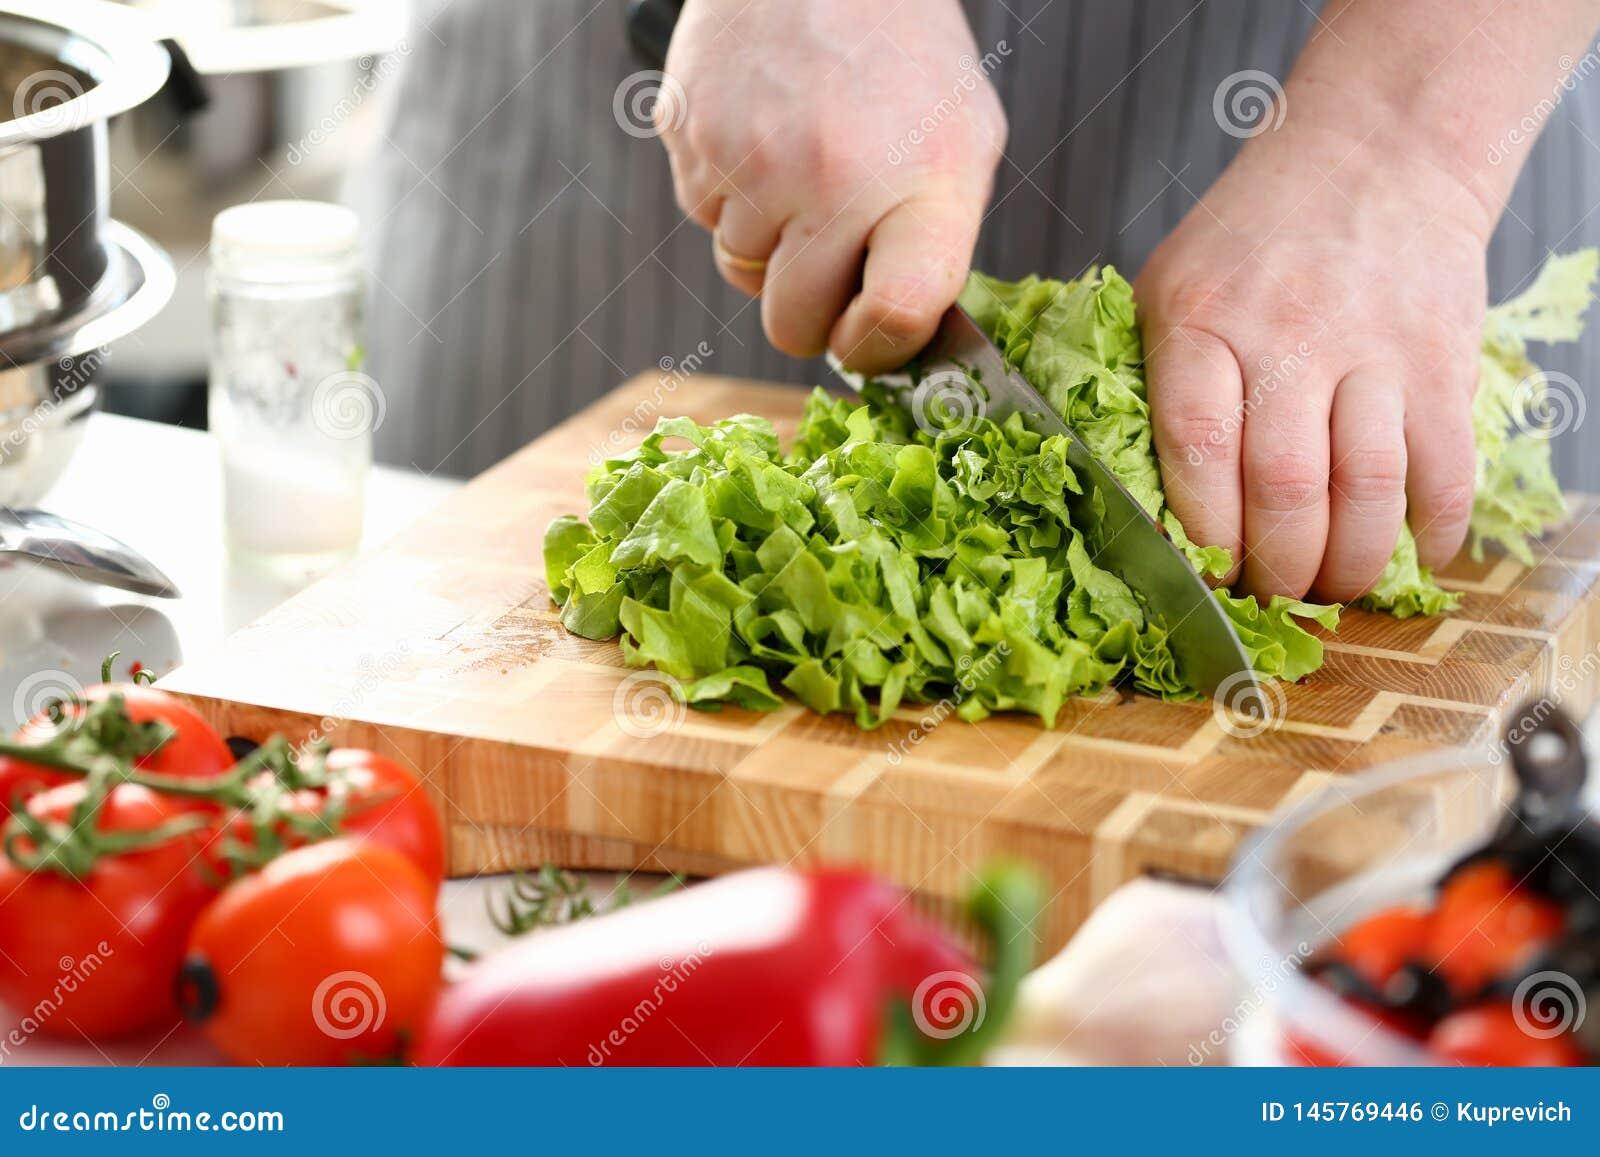 Frischer Kopfsalat-Bestandteil Chef-Hands Cutting Greens